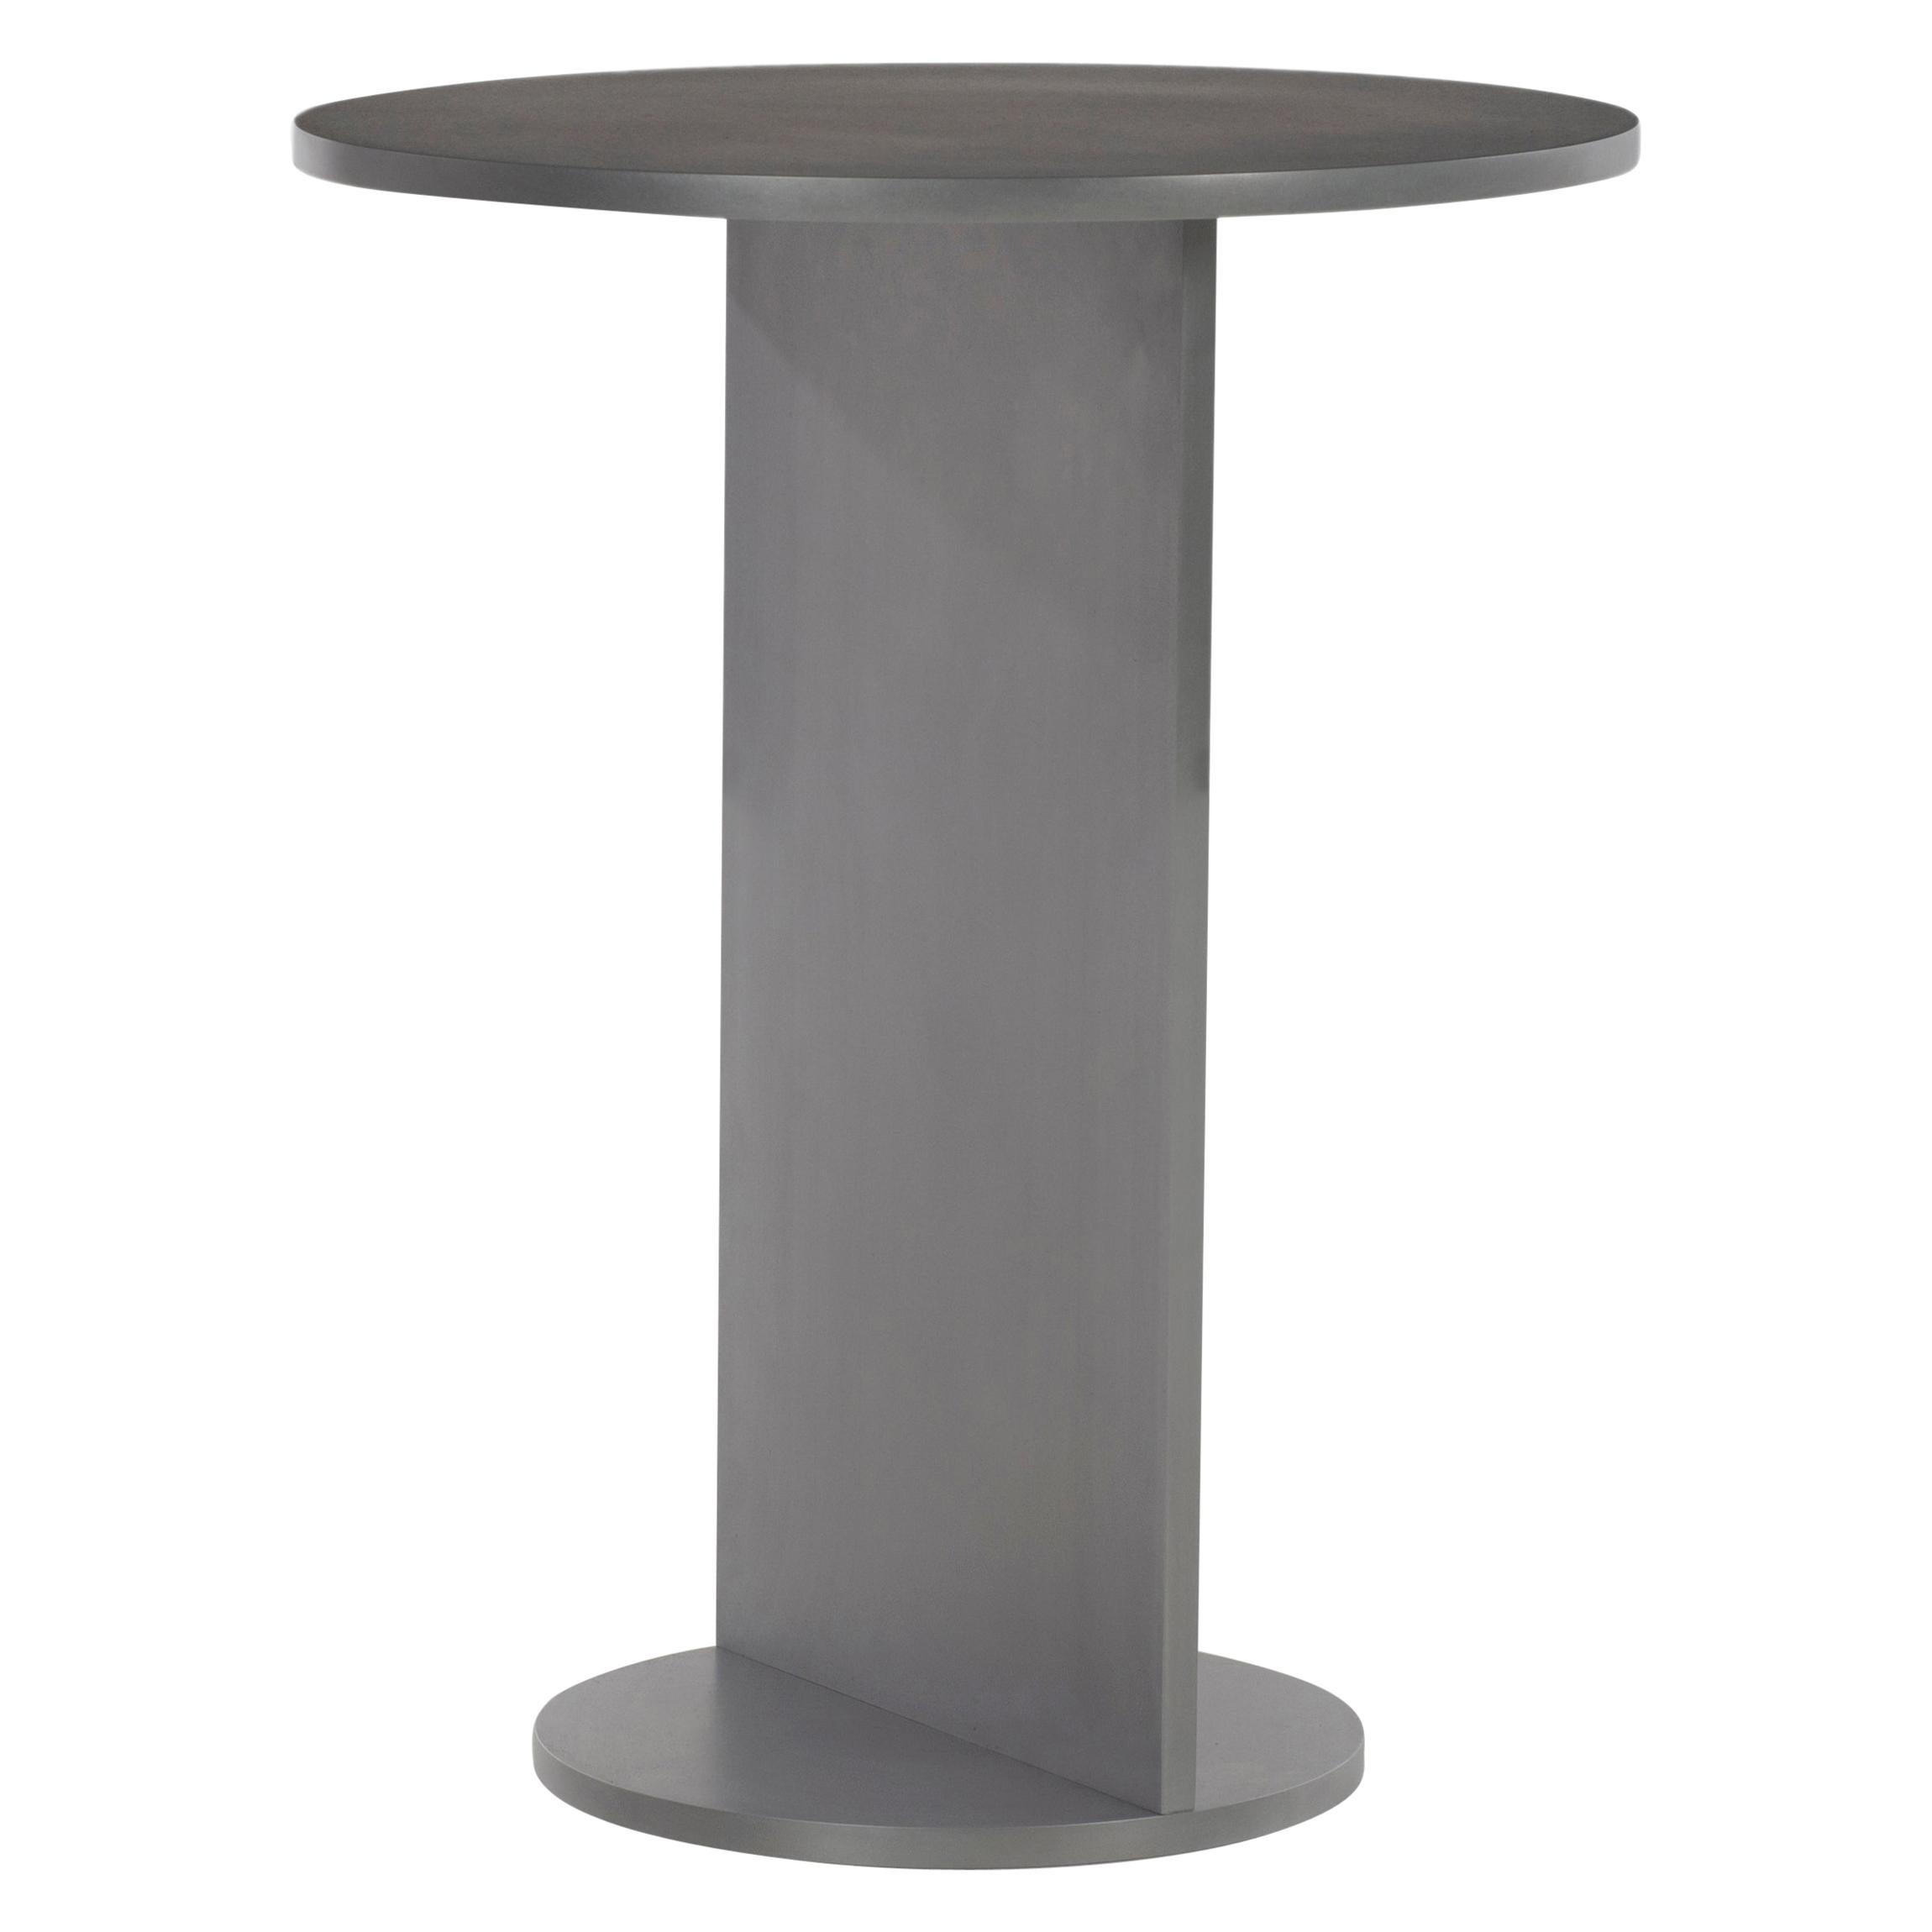 Eero Table in Wax-Polished Aluminum Plate by Jonathan Nesci